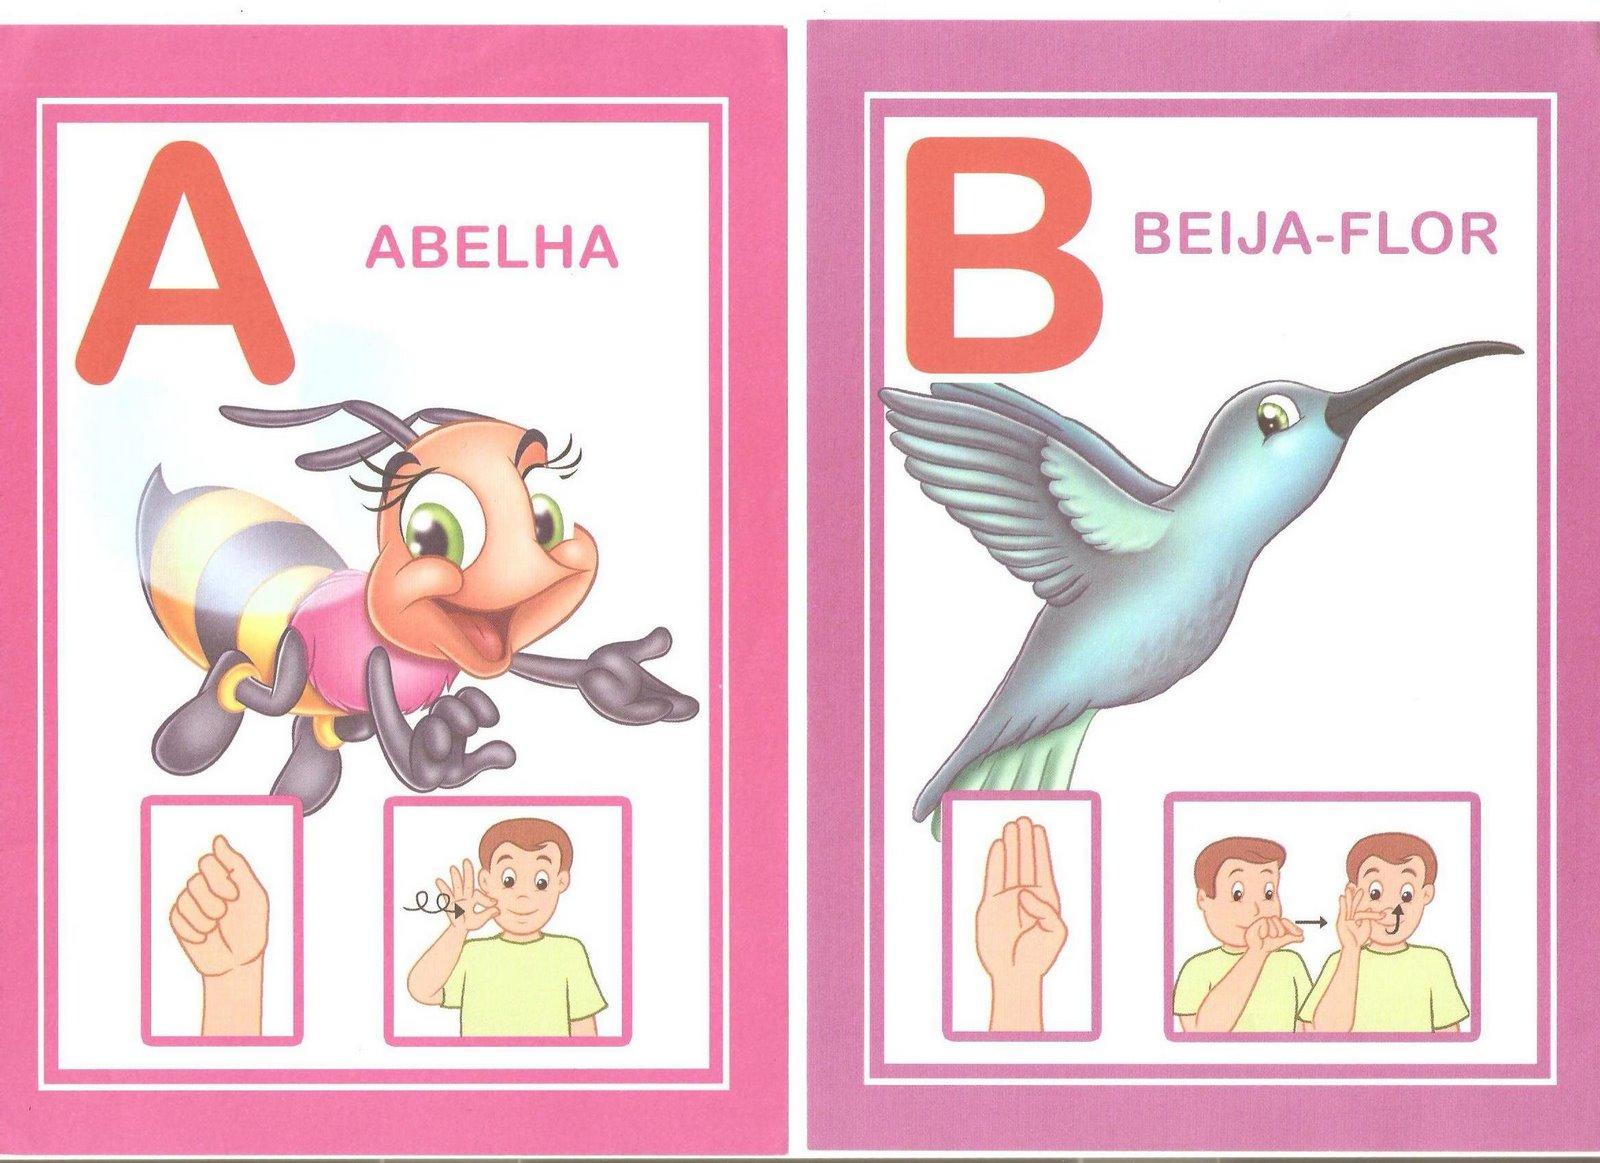 Aprendendo Libras: alfabeto ilustrado em libras #AA2149 1600 1163